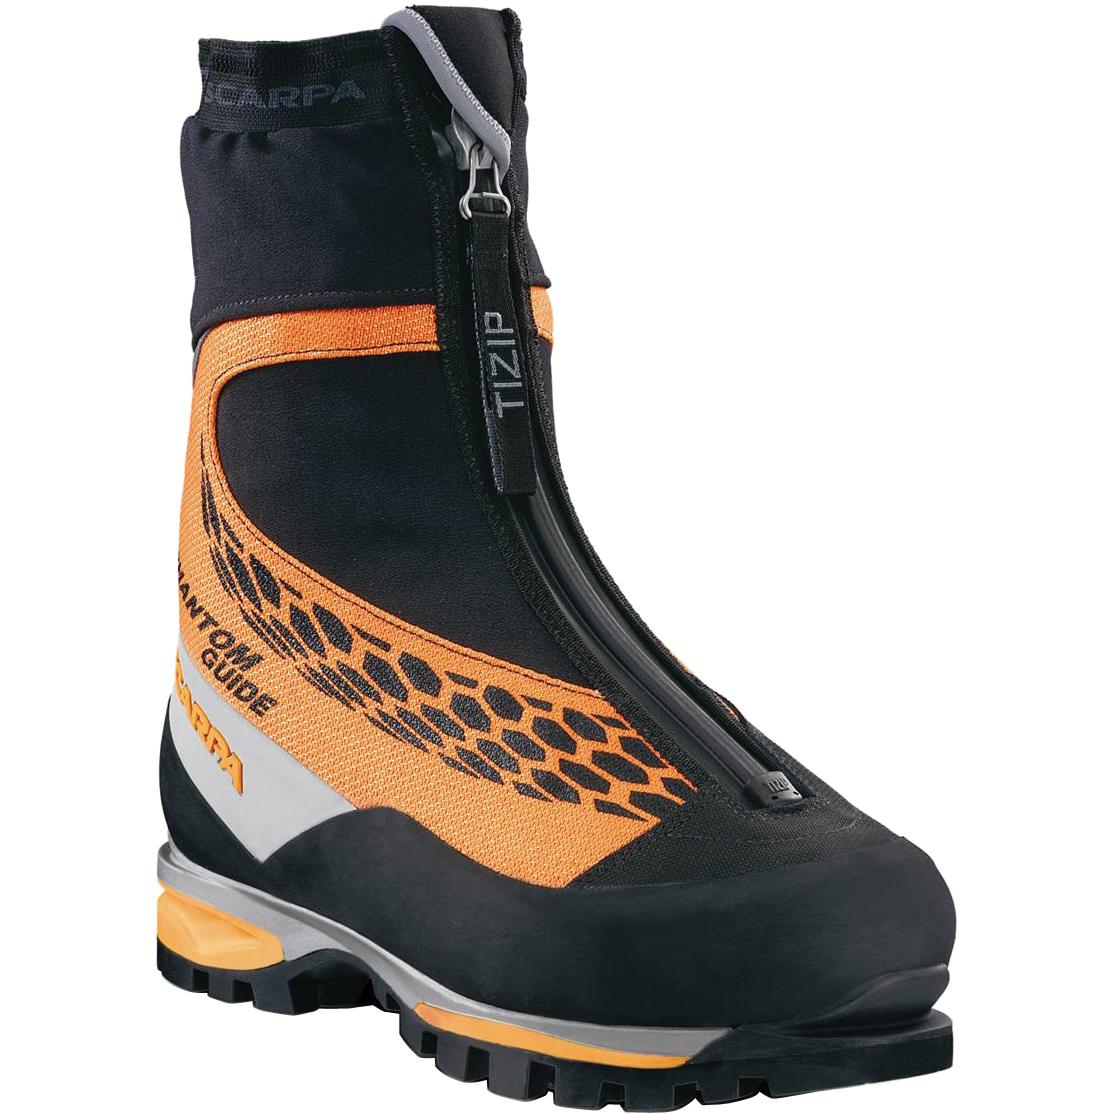 06defa6964771 Scarpa Phantom Guide Mountaineering Boots - Men s